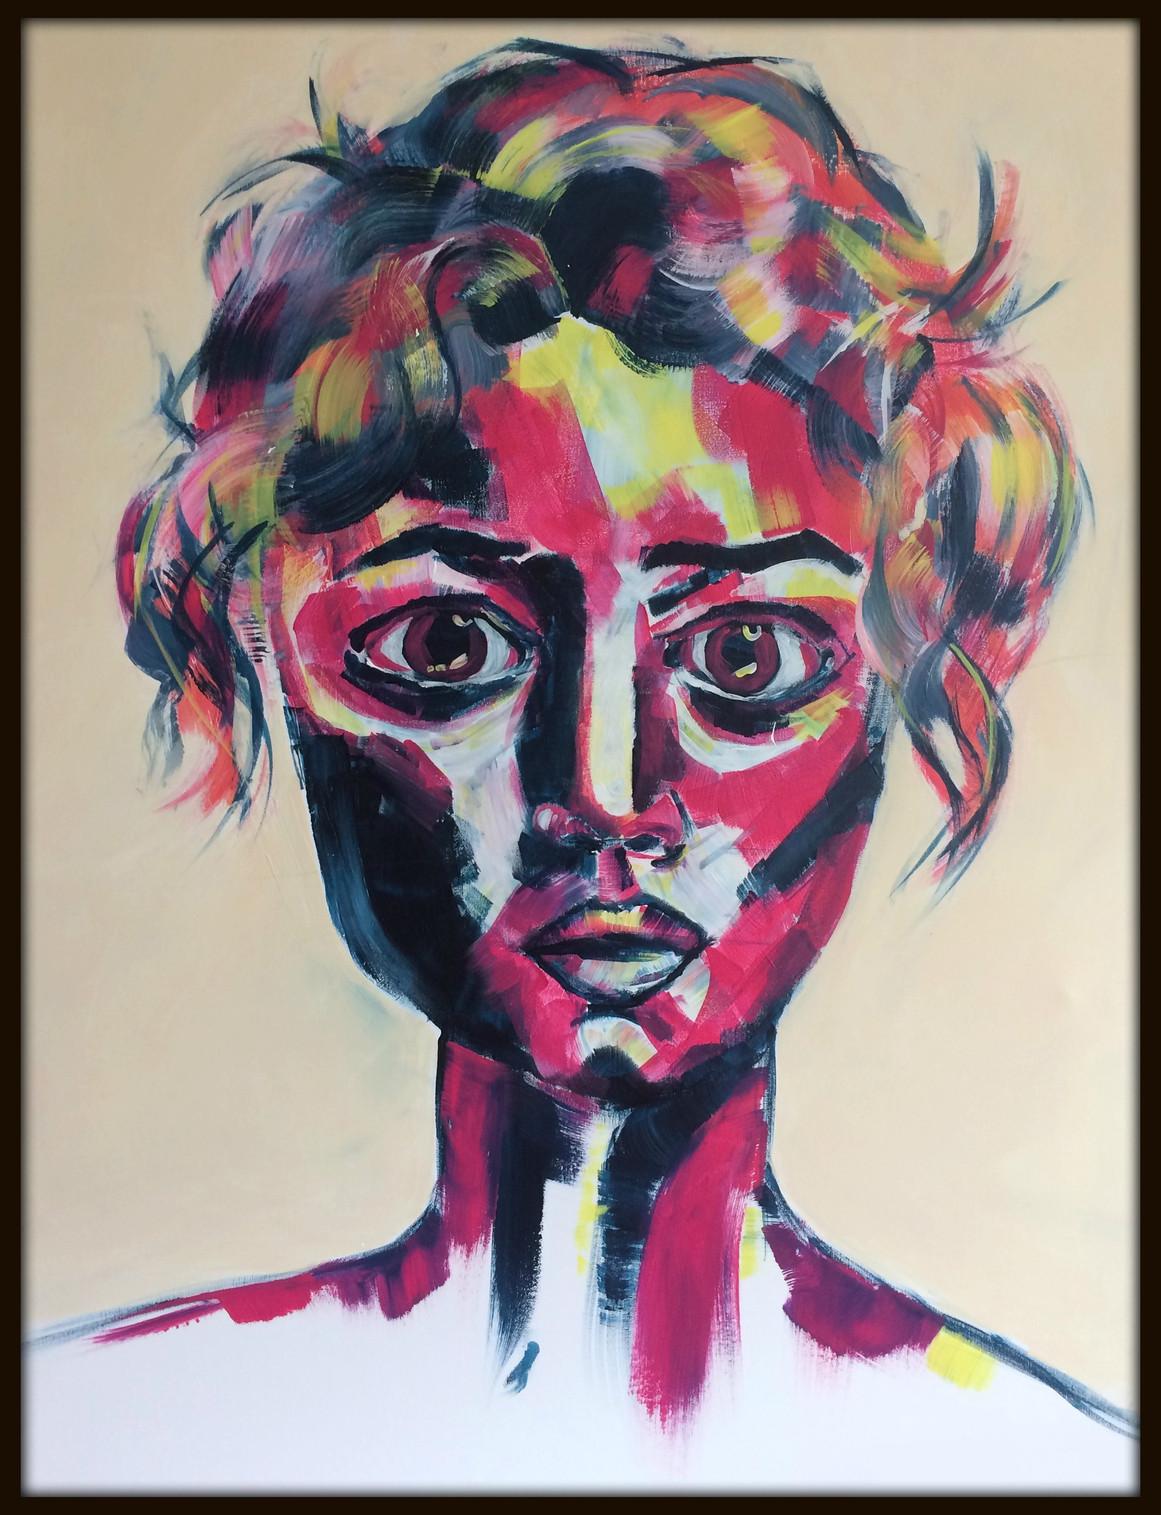 Jane Eyre - SOLD